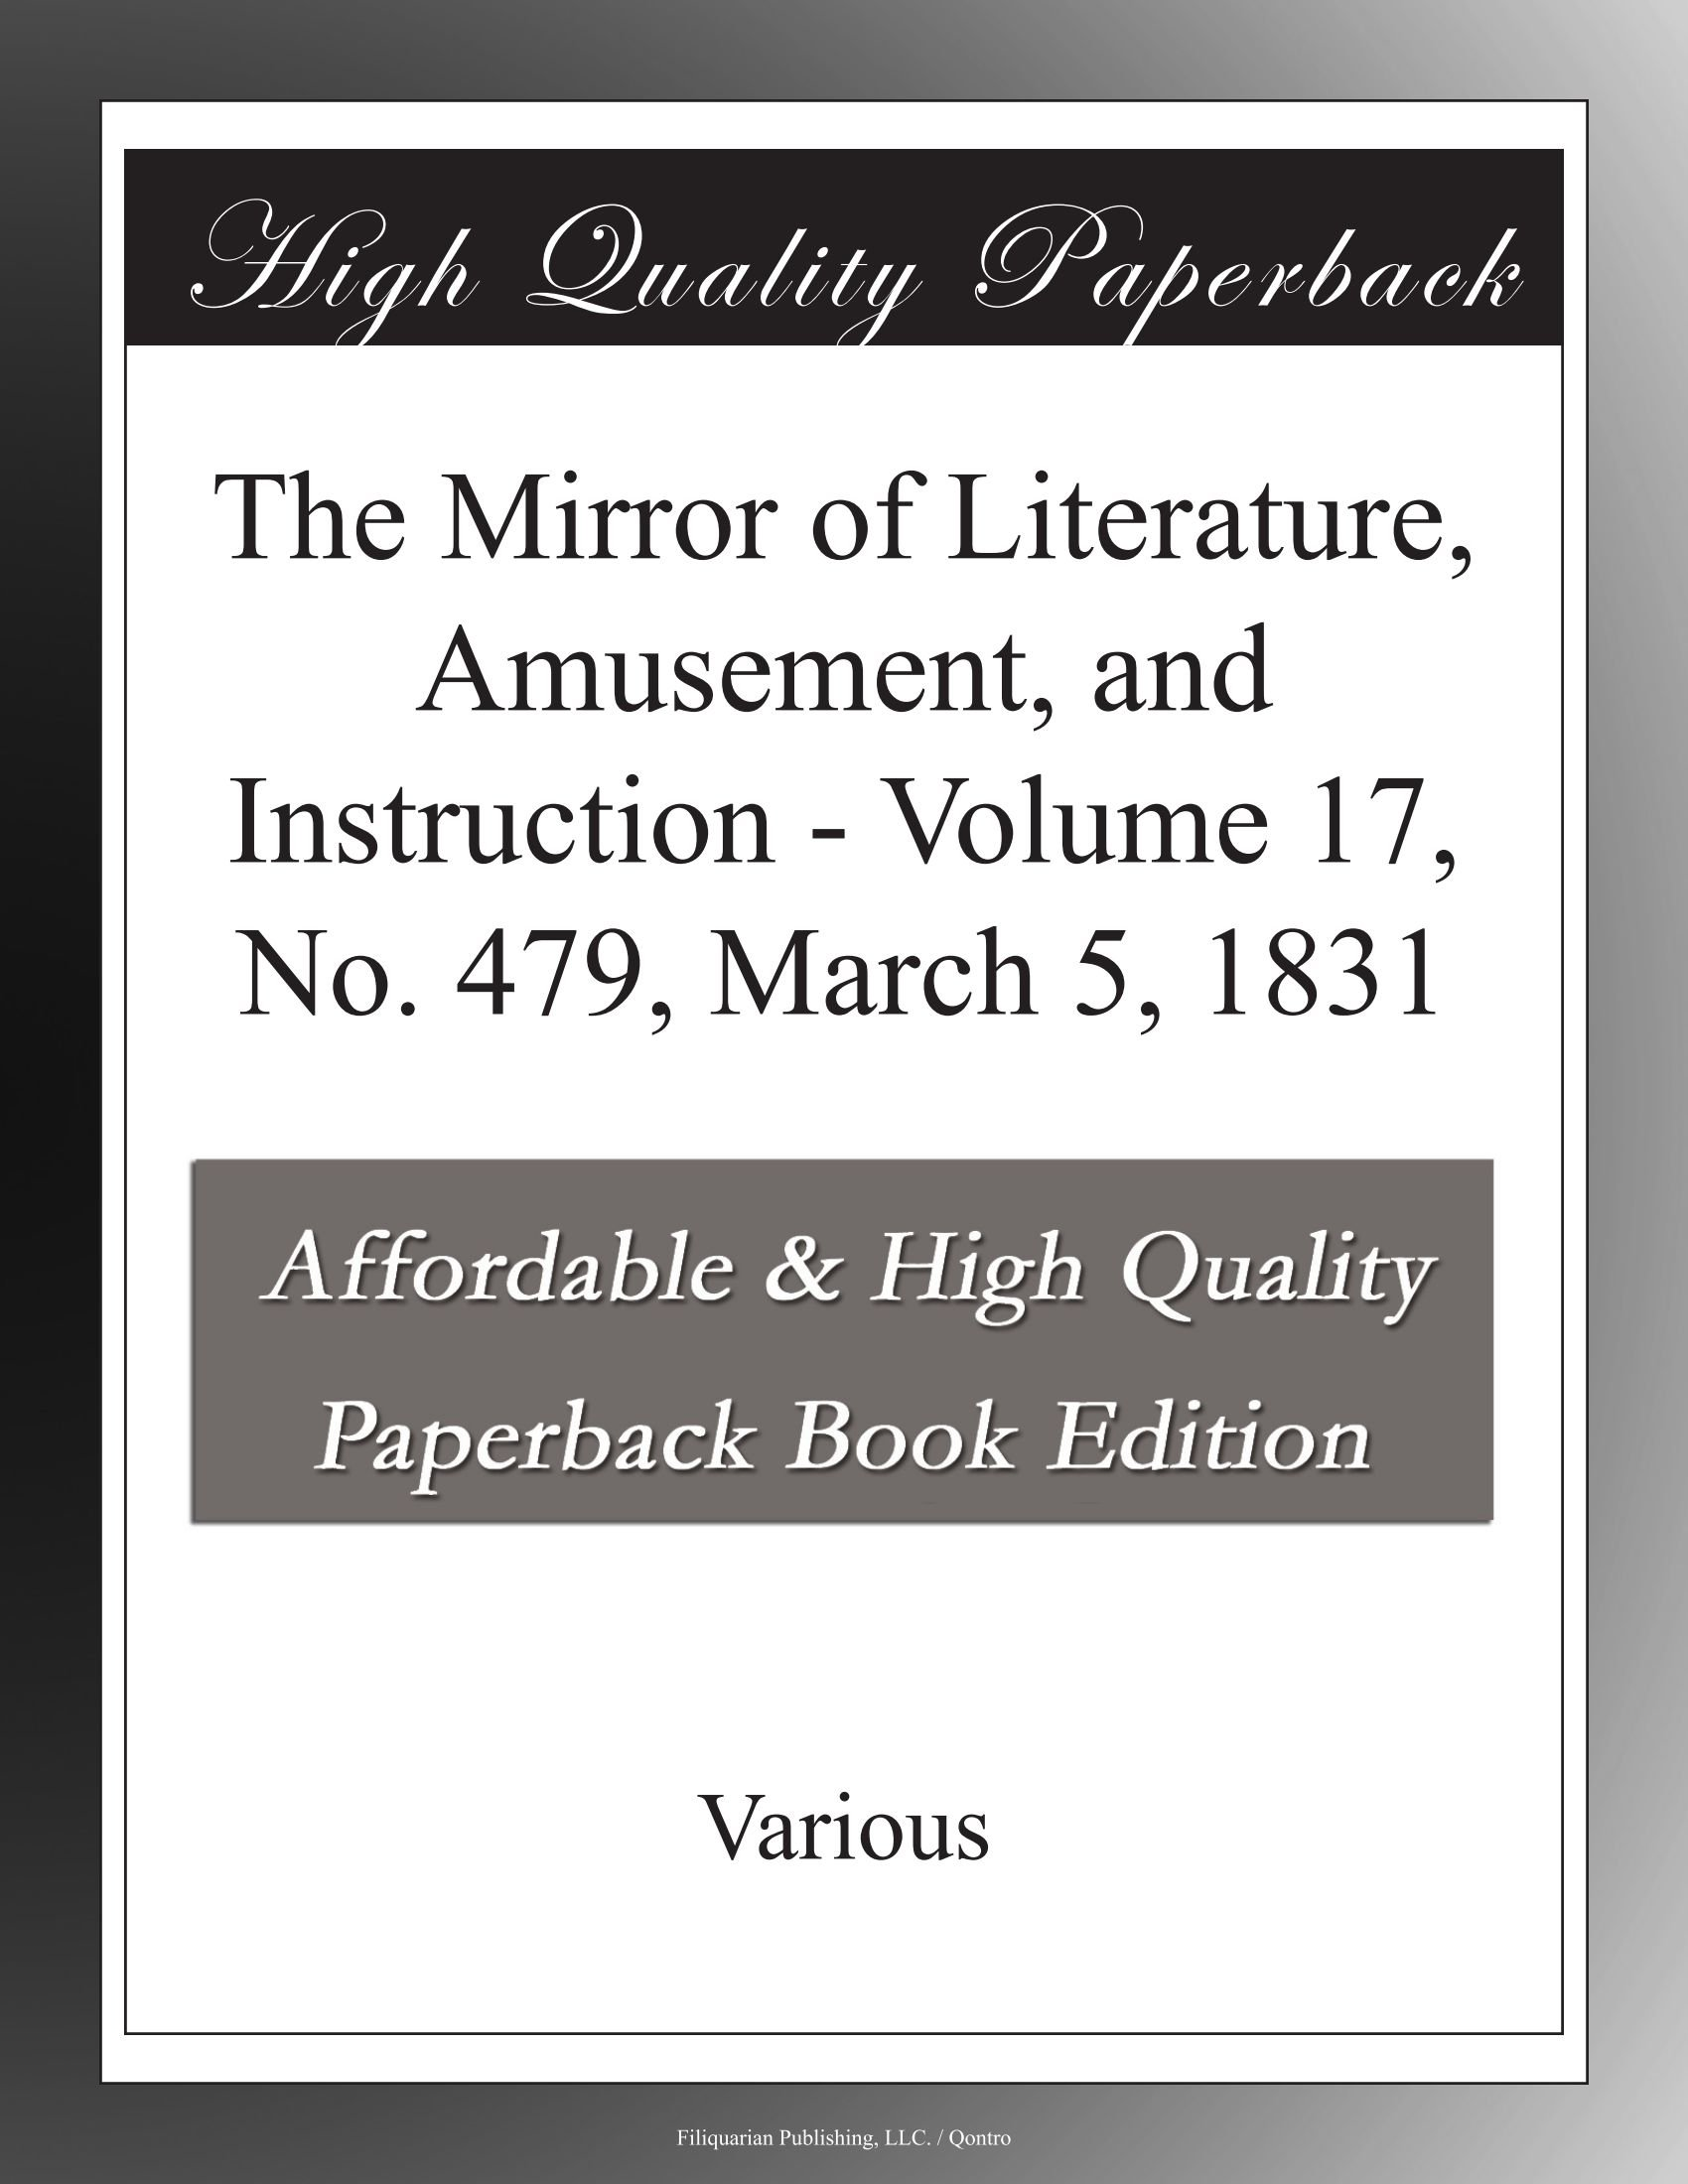 The Mirror of Literature, Amusement, and Instruction - Volume 17, No. 479, March 5, 1831 pdf epub